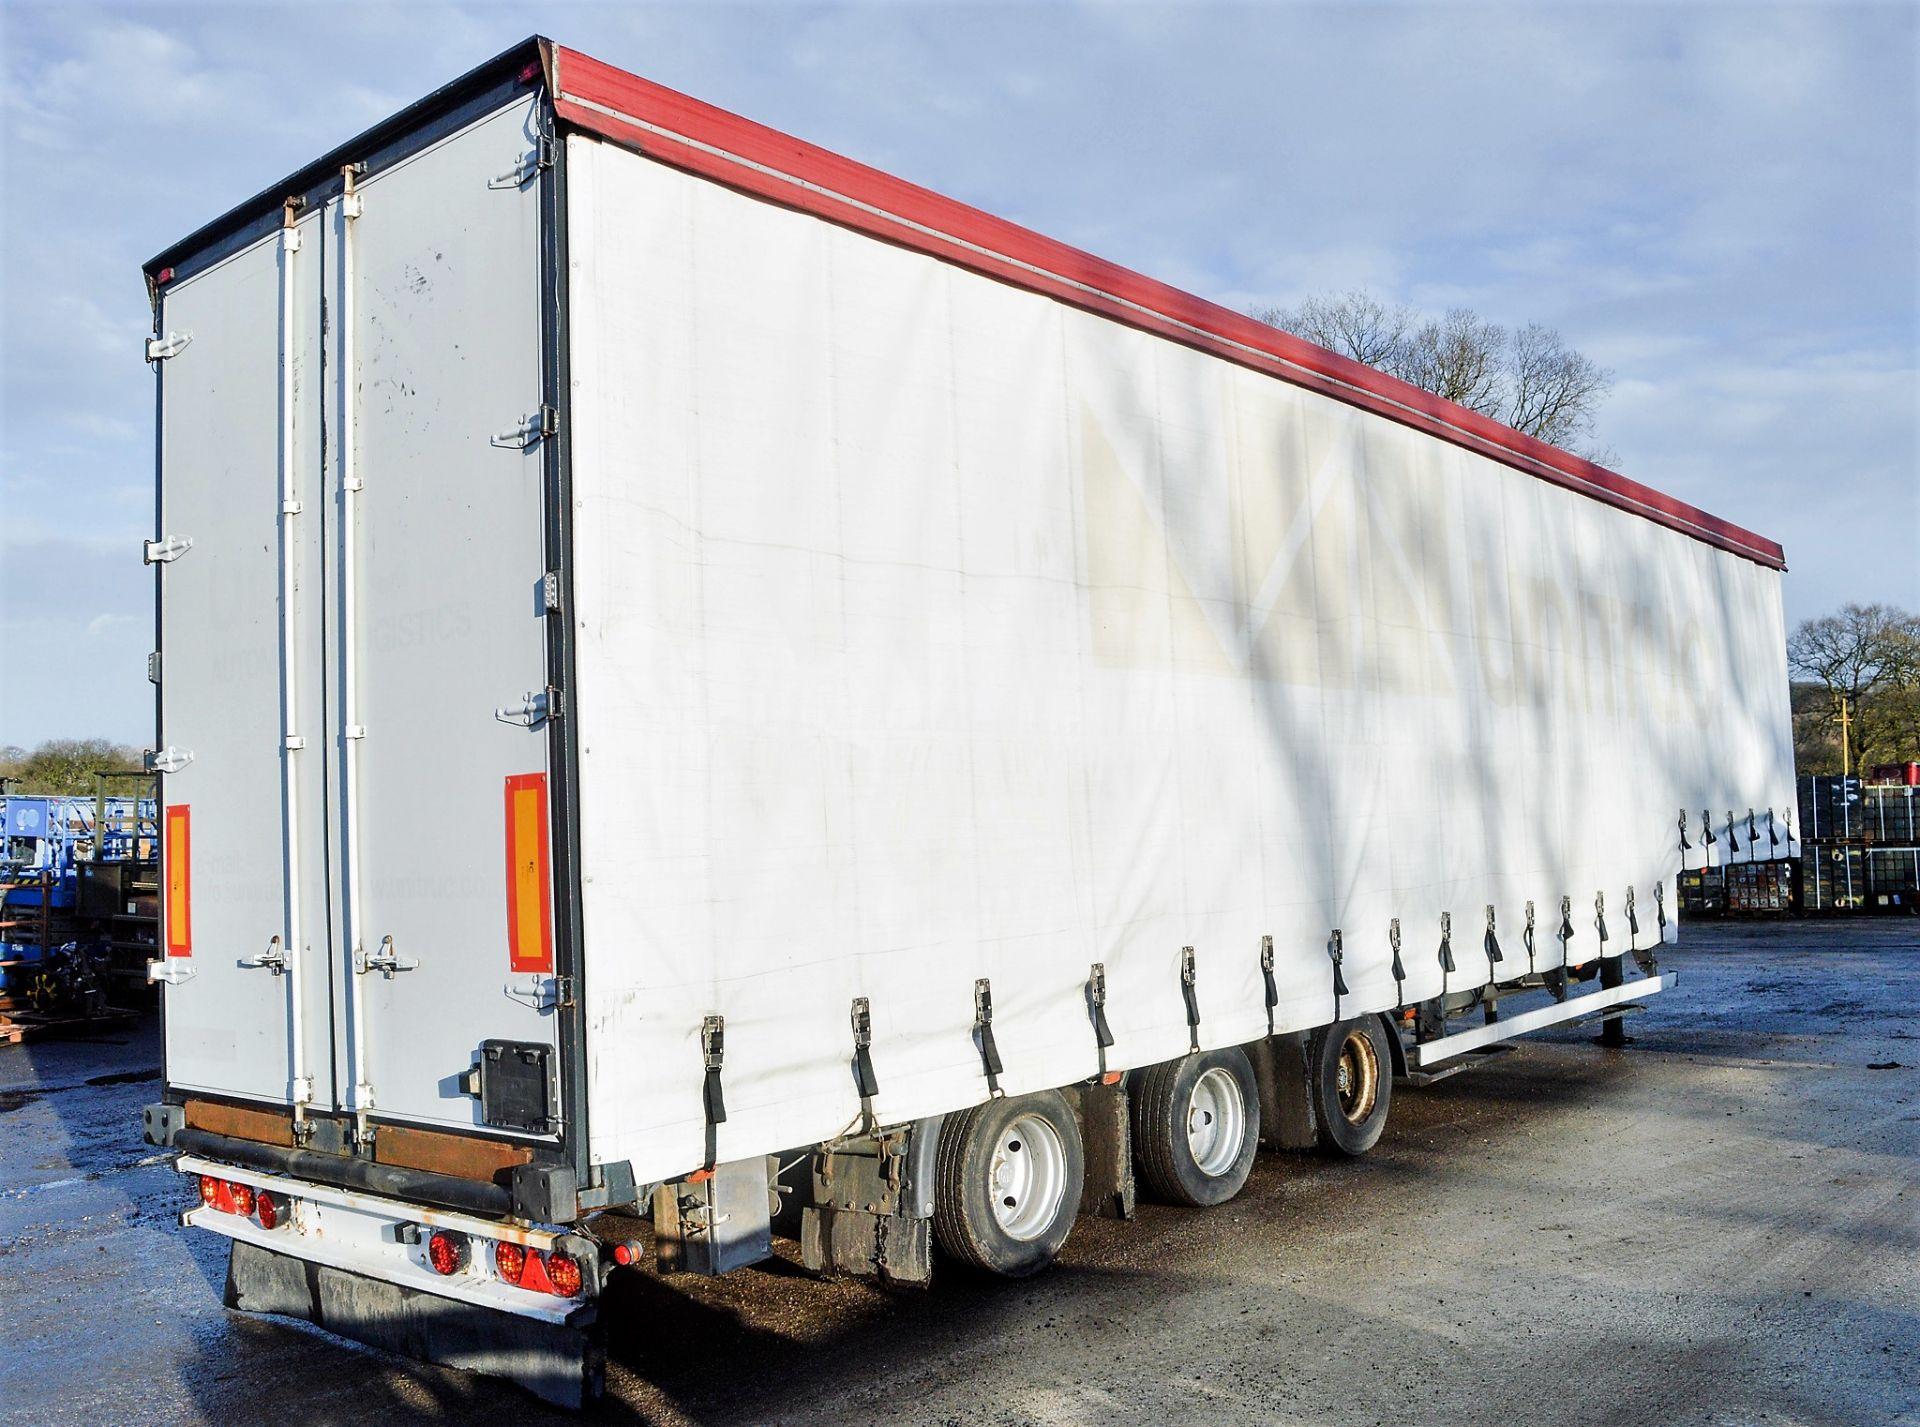 Lot 61A - Kel-Berg 13.6 metre step frame tri axle twin hydraulic deck covered car transporter trailer Year: